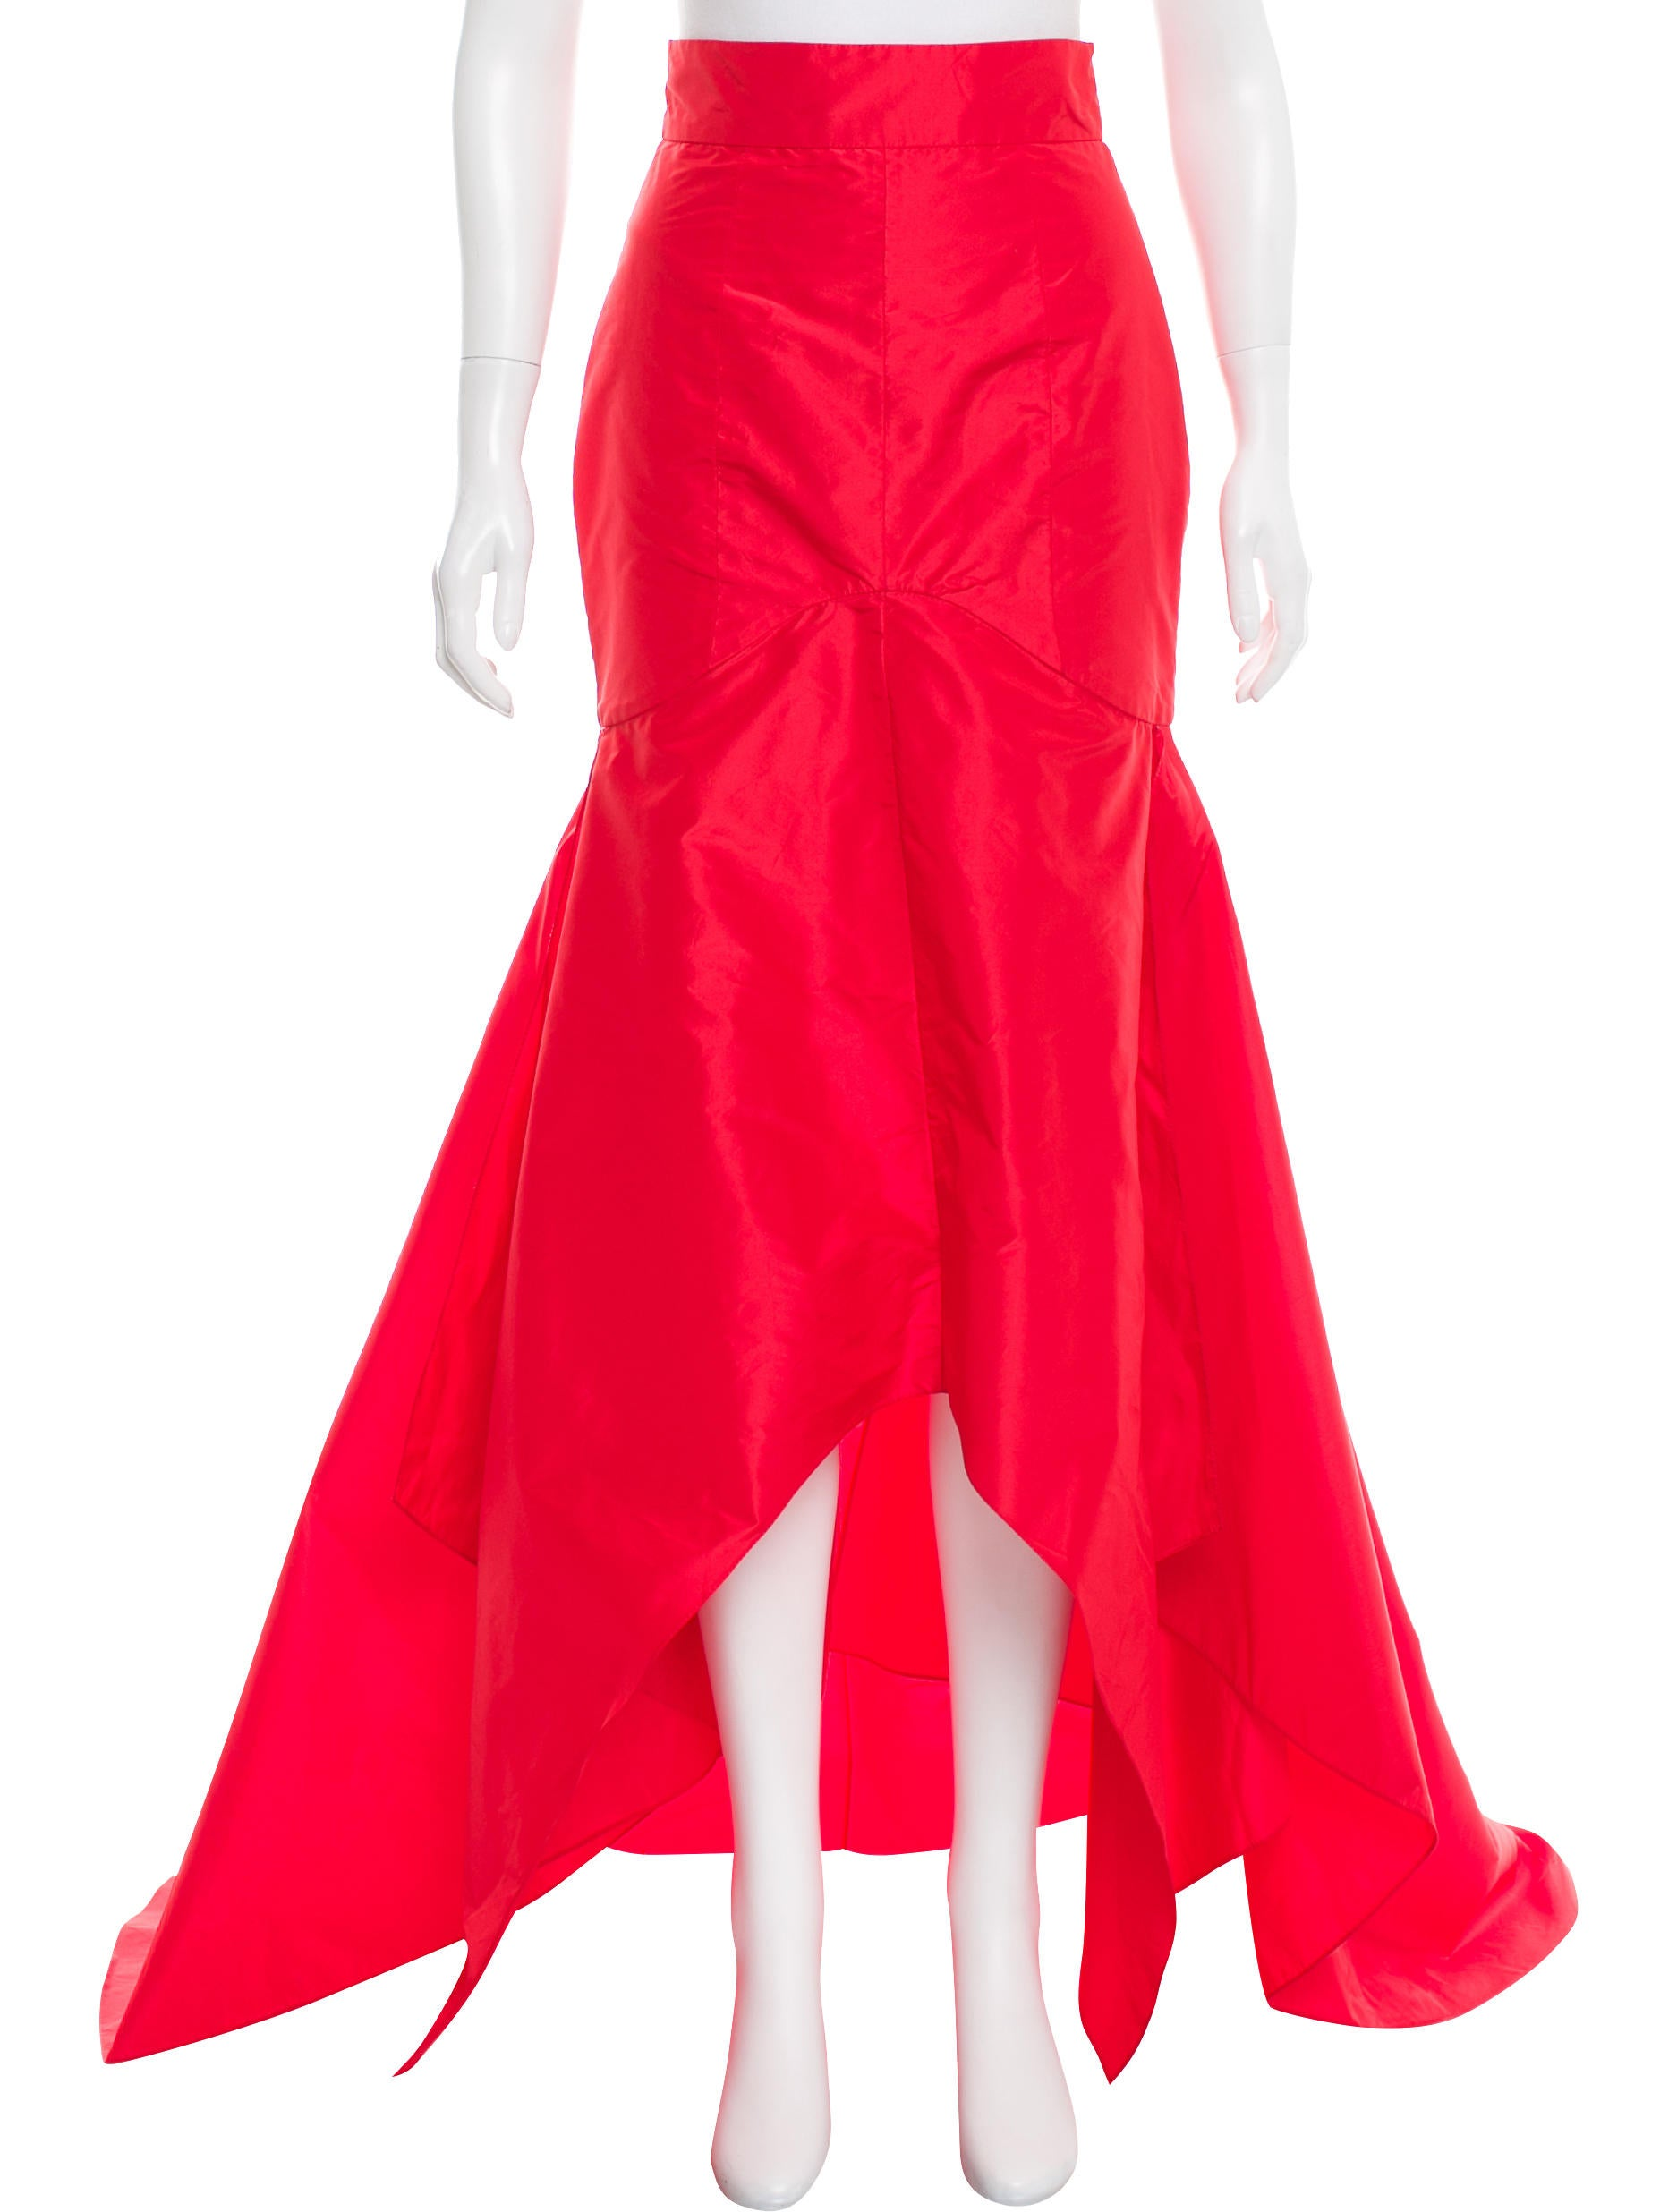 equihua equihua capote de matador skirt w tags clothing wequi20001 the realreal. Black Bedroom Furniture Sets. Home Design Ideas